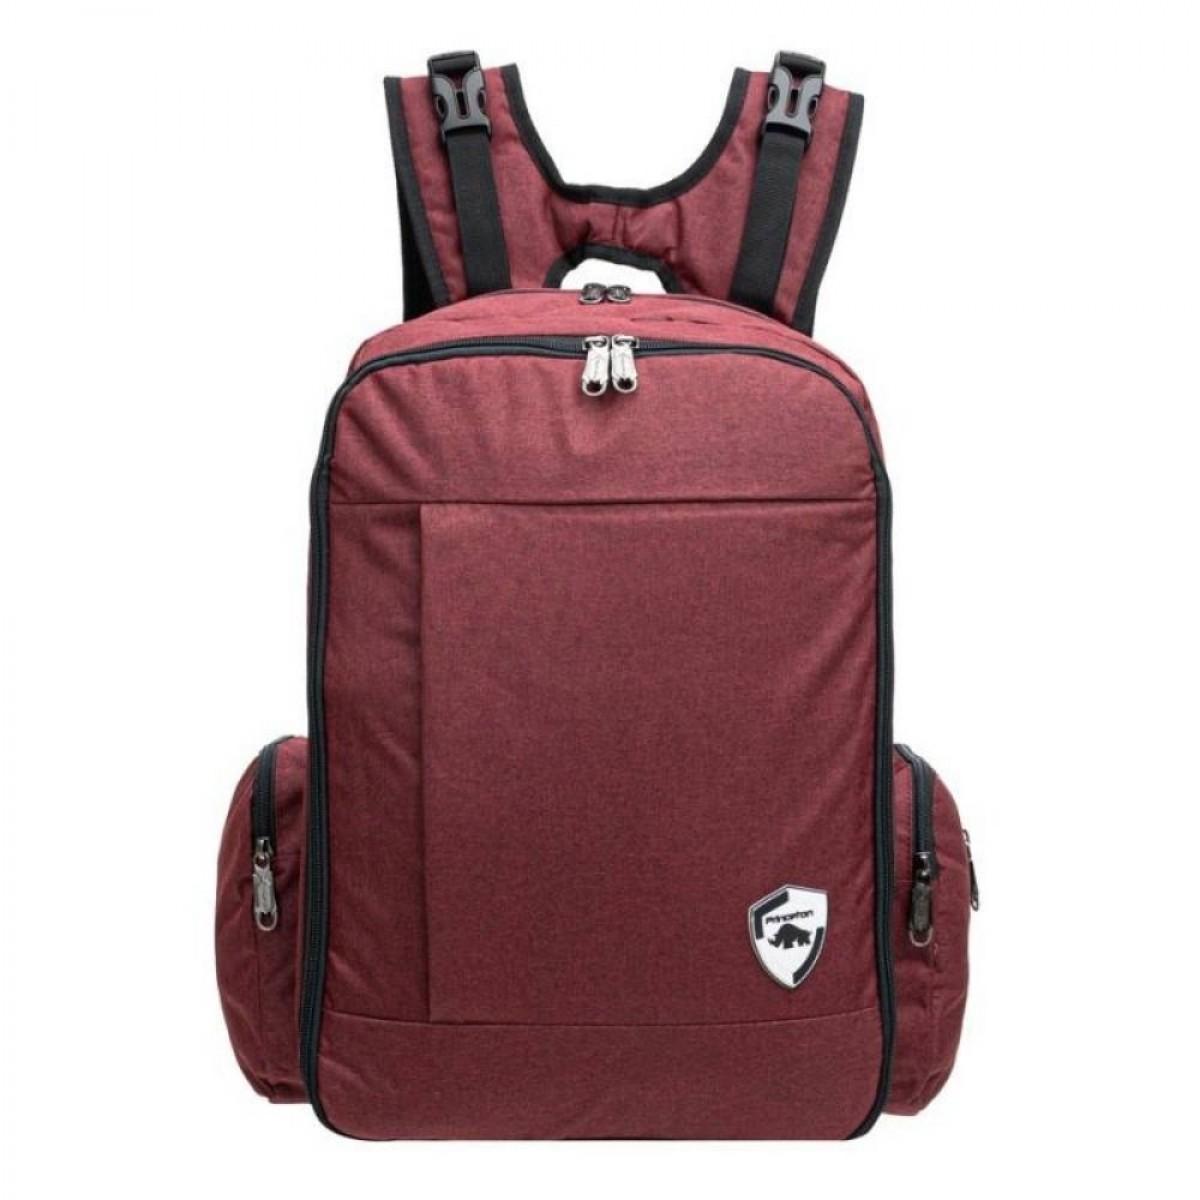 Princeton Starwalker X Series Baby Diaper Bag - Maroon / Black / Jeans Blue - Lifetime Warranty